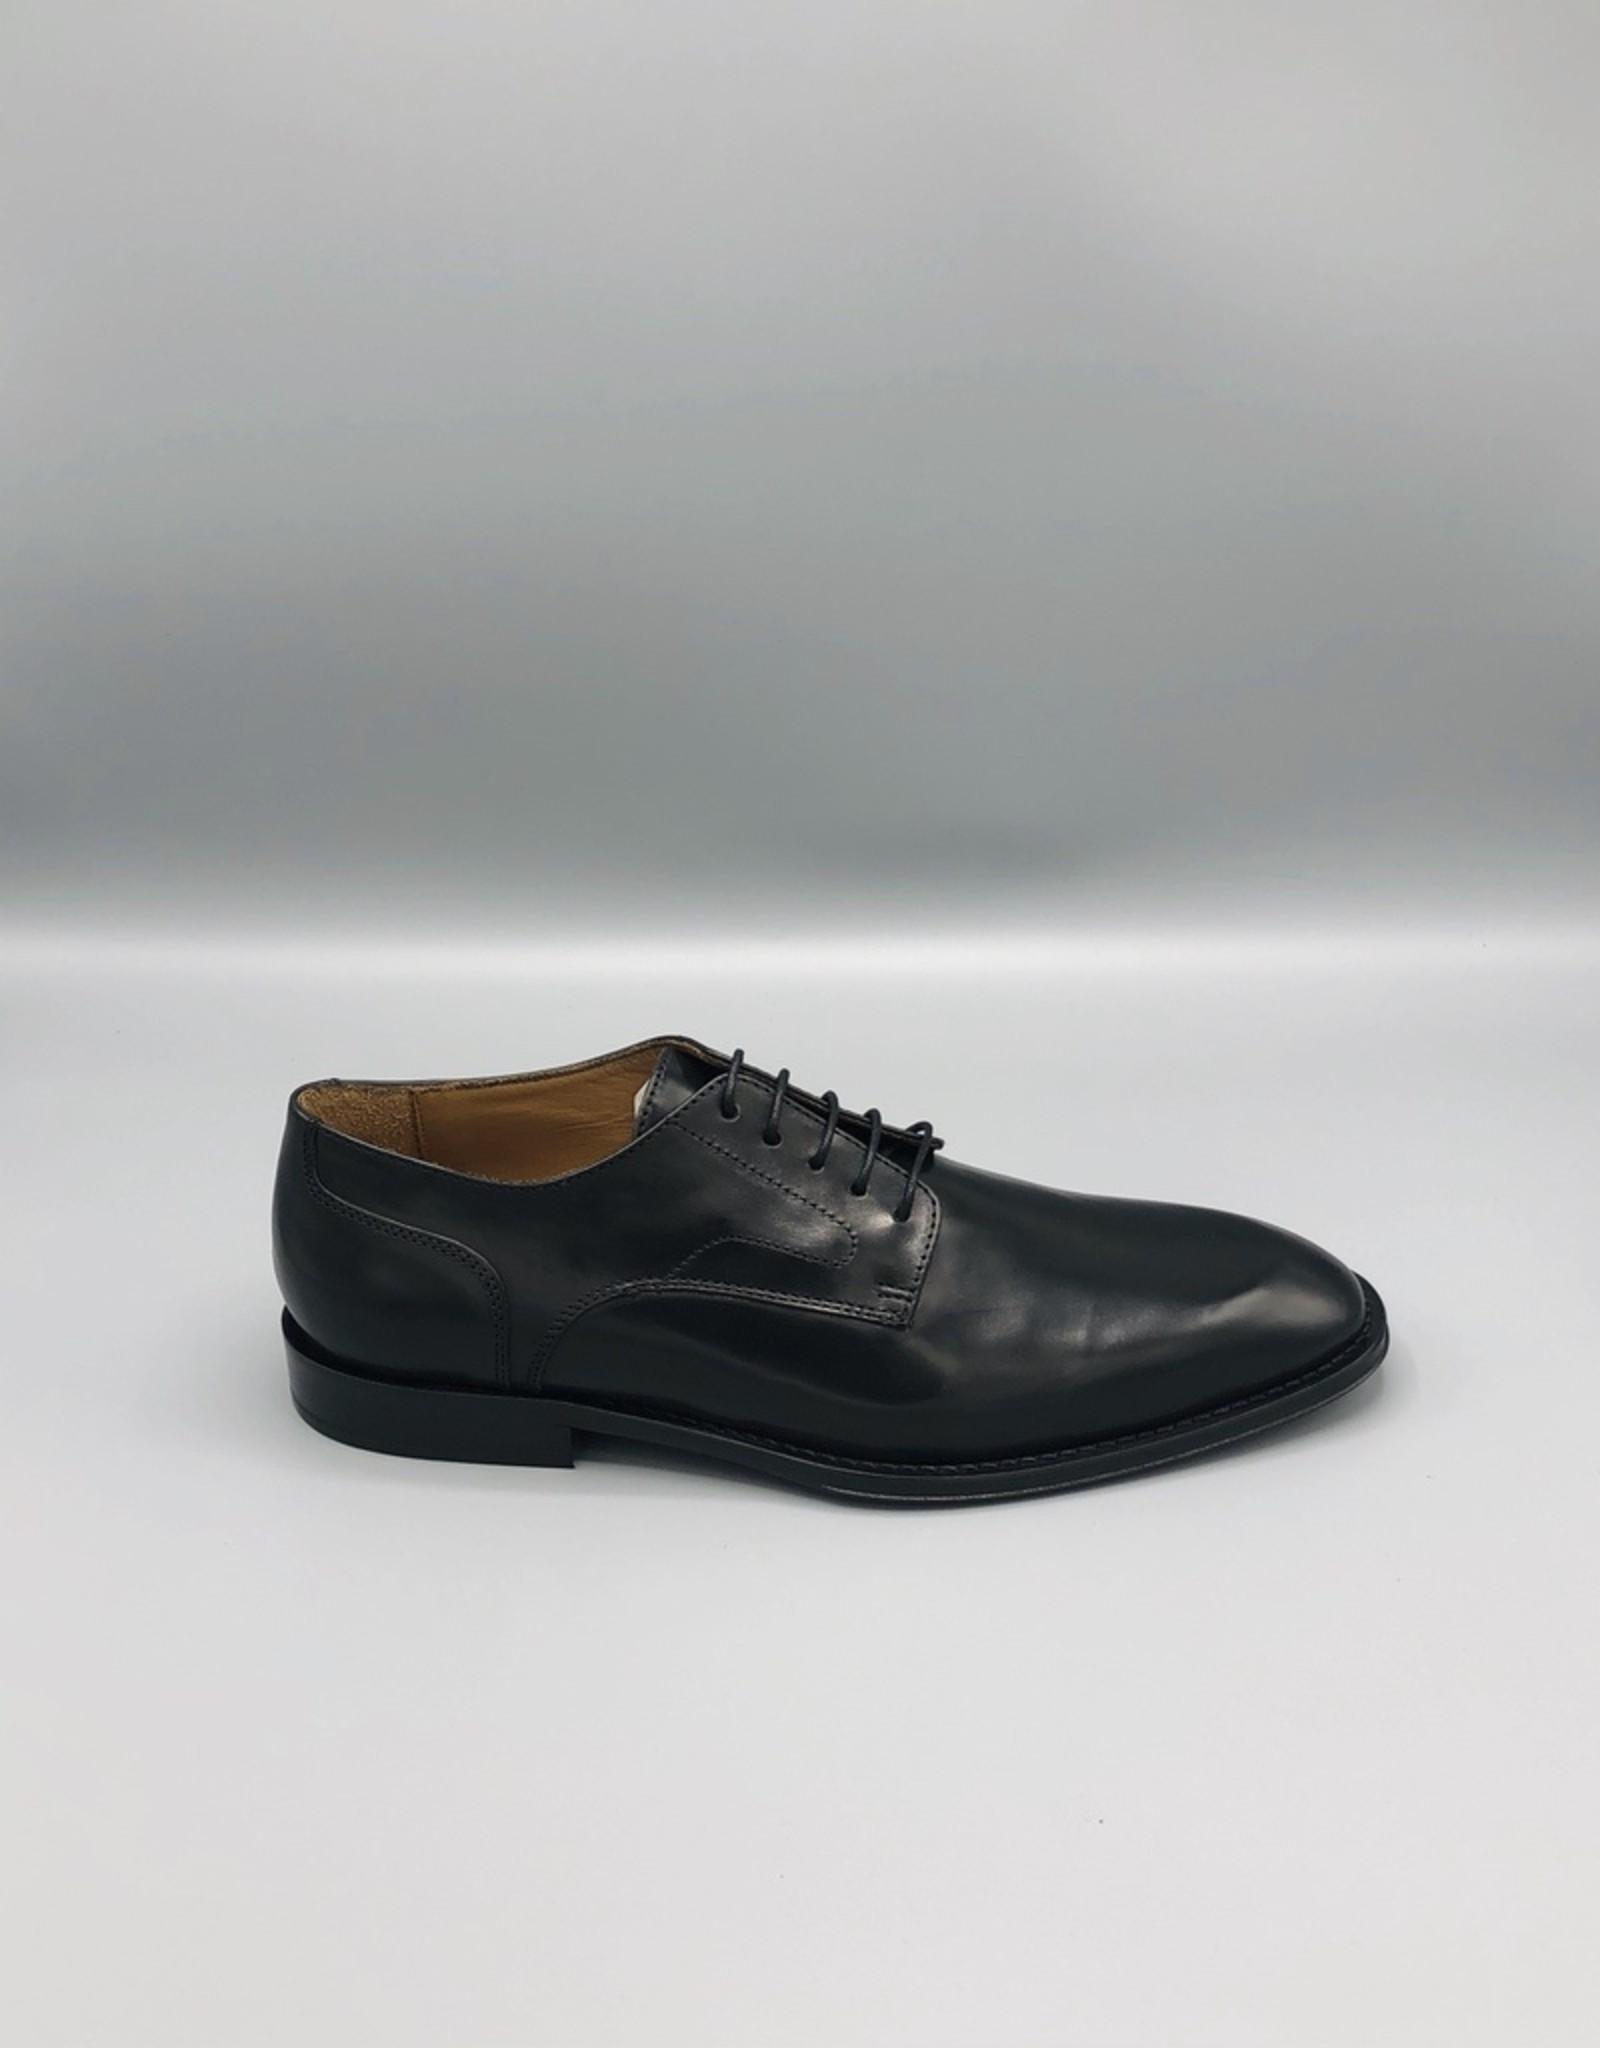 Manovie Toscane Manovie Toscane Diver Classic Lace Up Dress Shoe